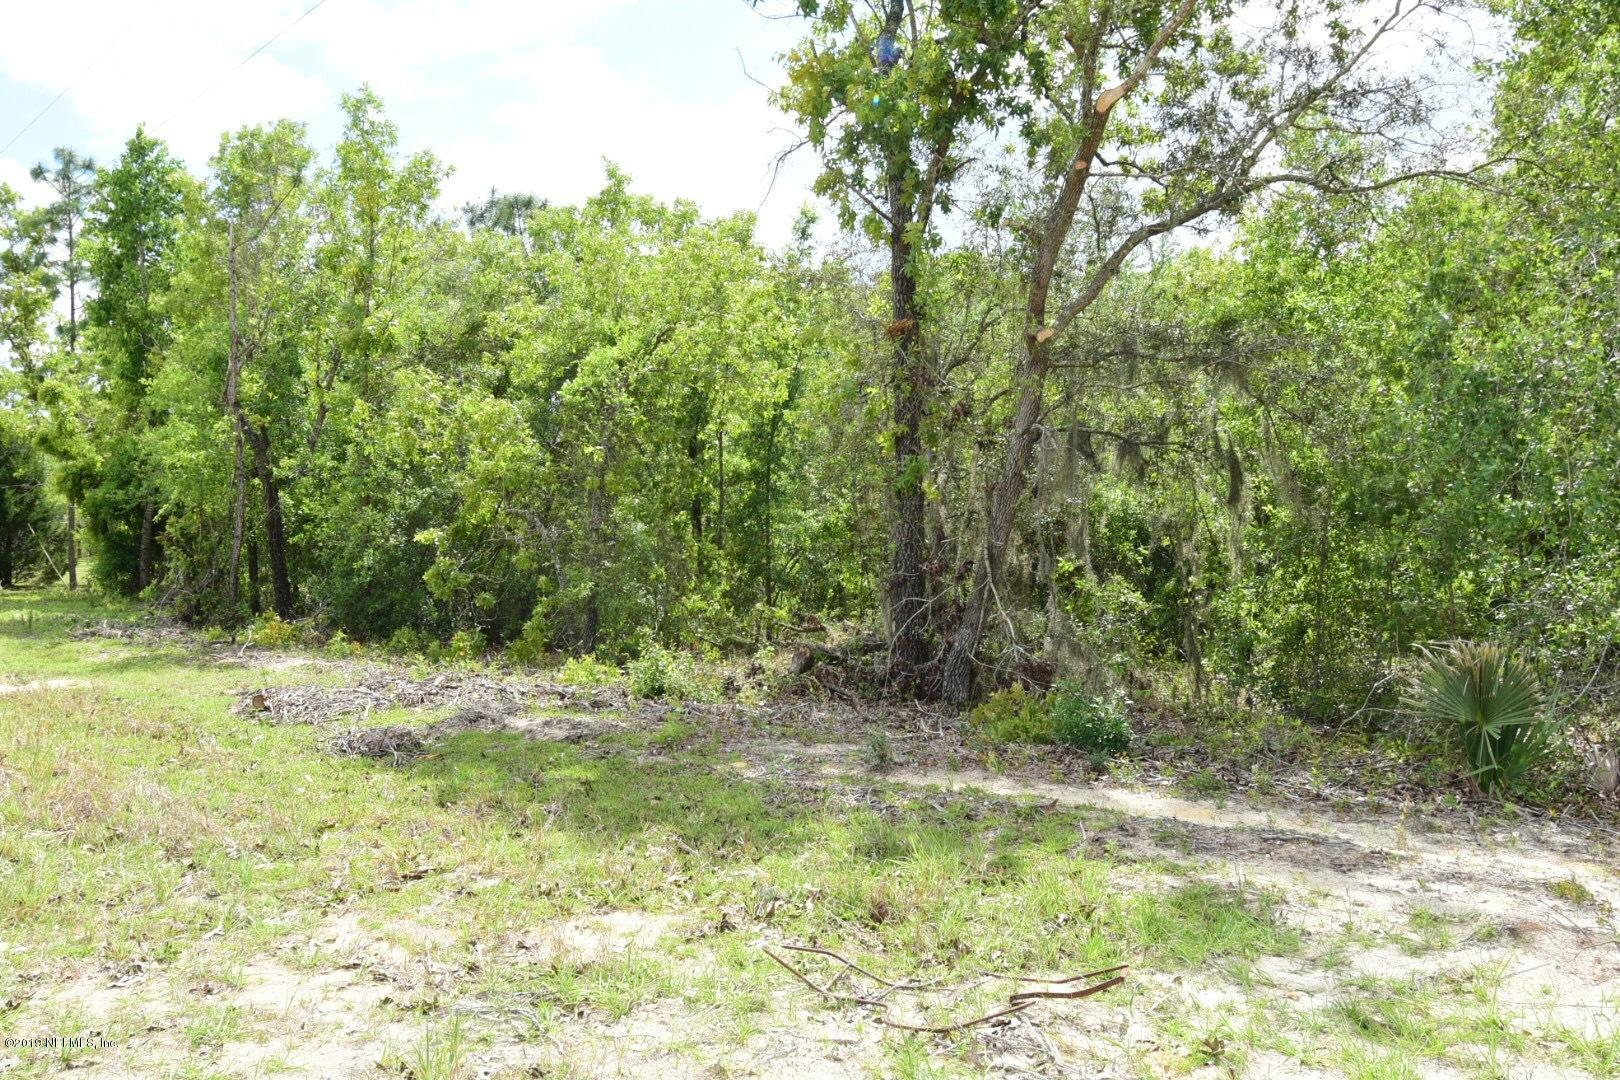 0 LONG BRANCH TRAIL, INTERLACHEN, FLORIDA 32148, ,Vacant land,For sale,LONG BRANCH TRAIL,990130